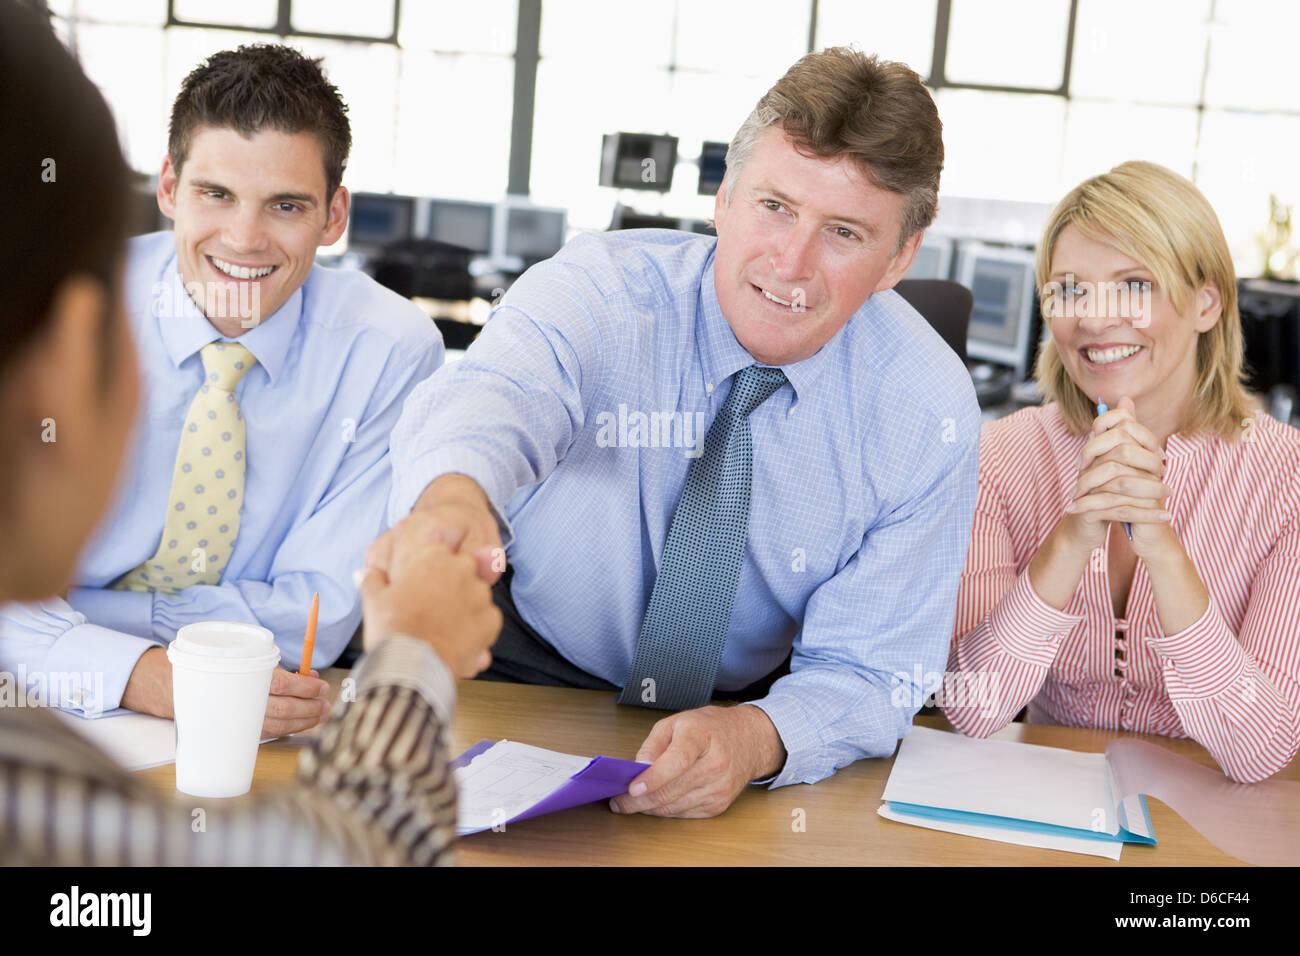 handshake,job interview,interview,business partnership - Stock Image